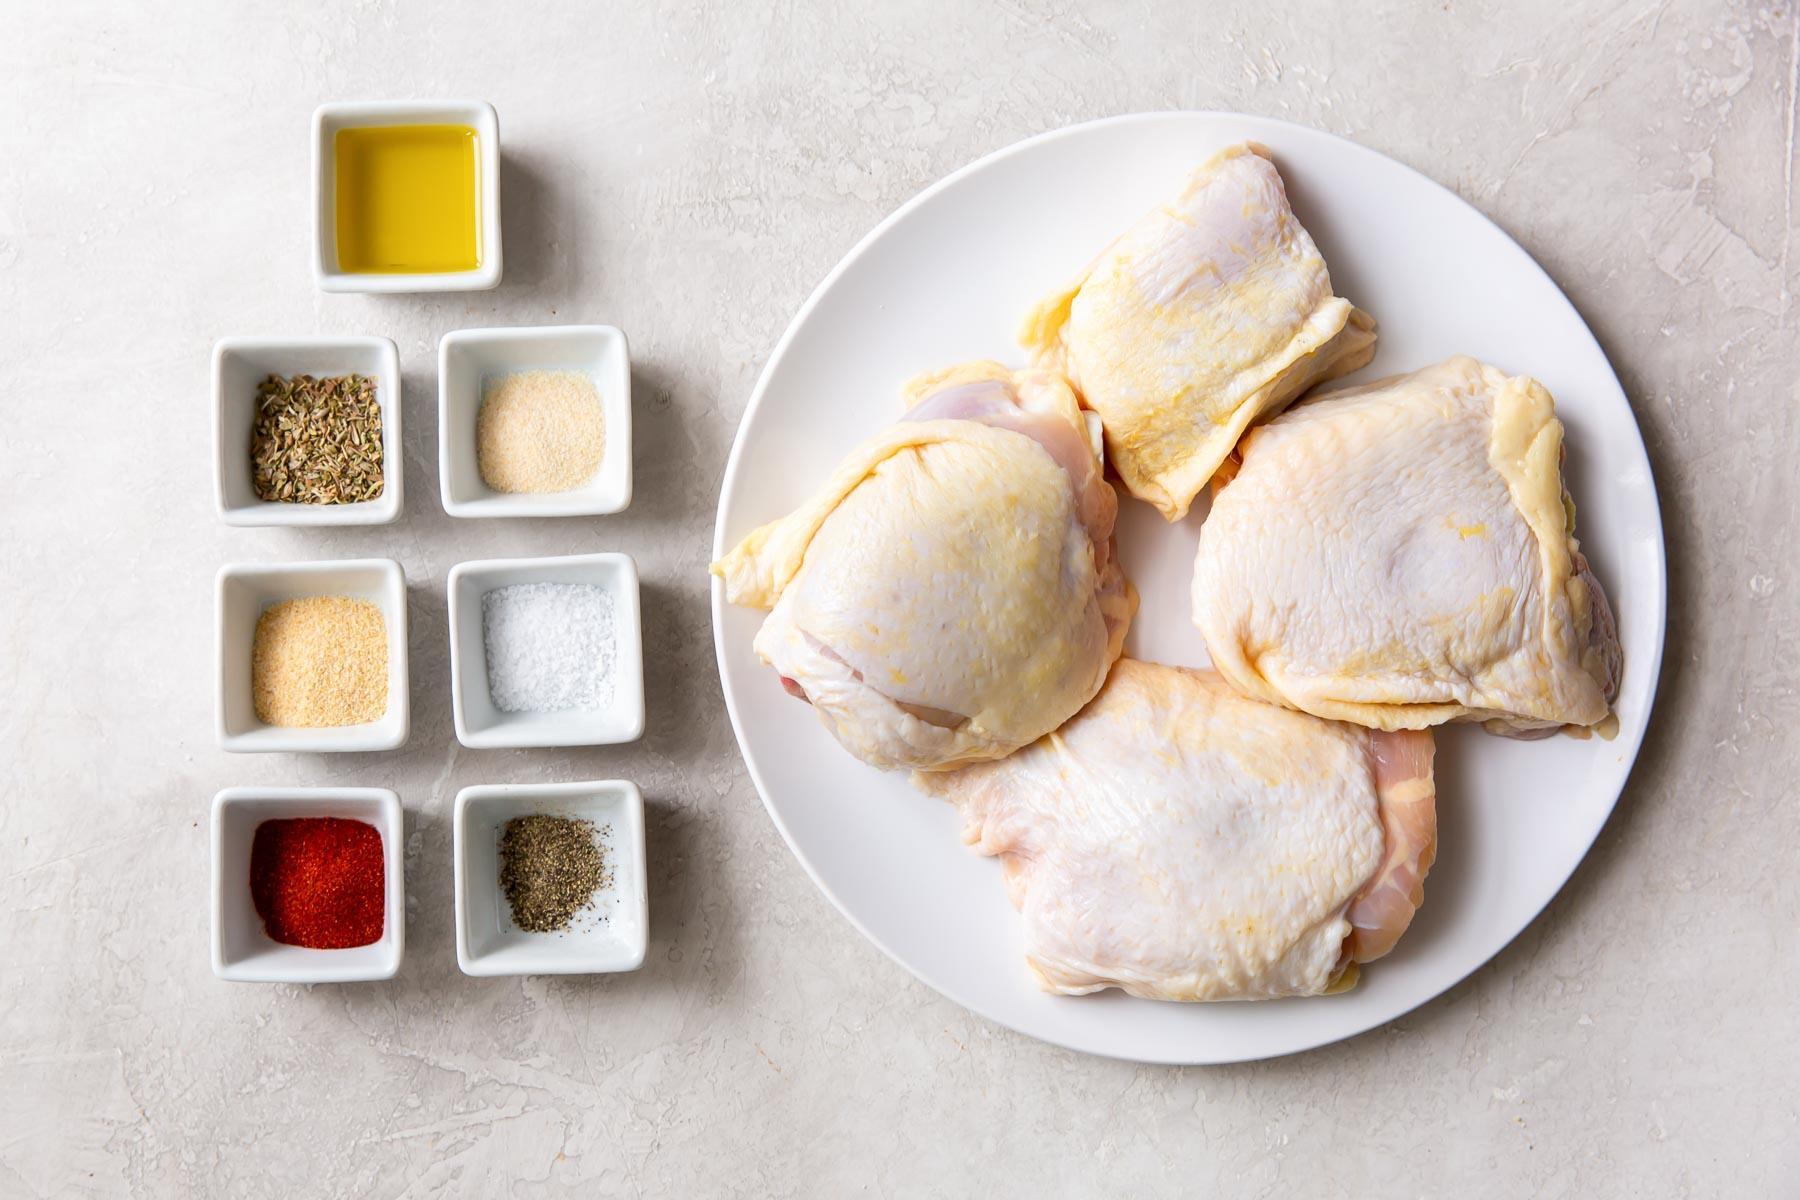 ingredients for air fryer chicken thighs recipe